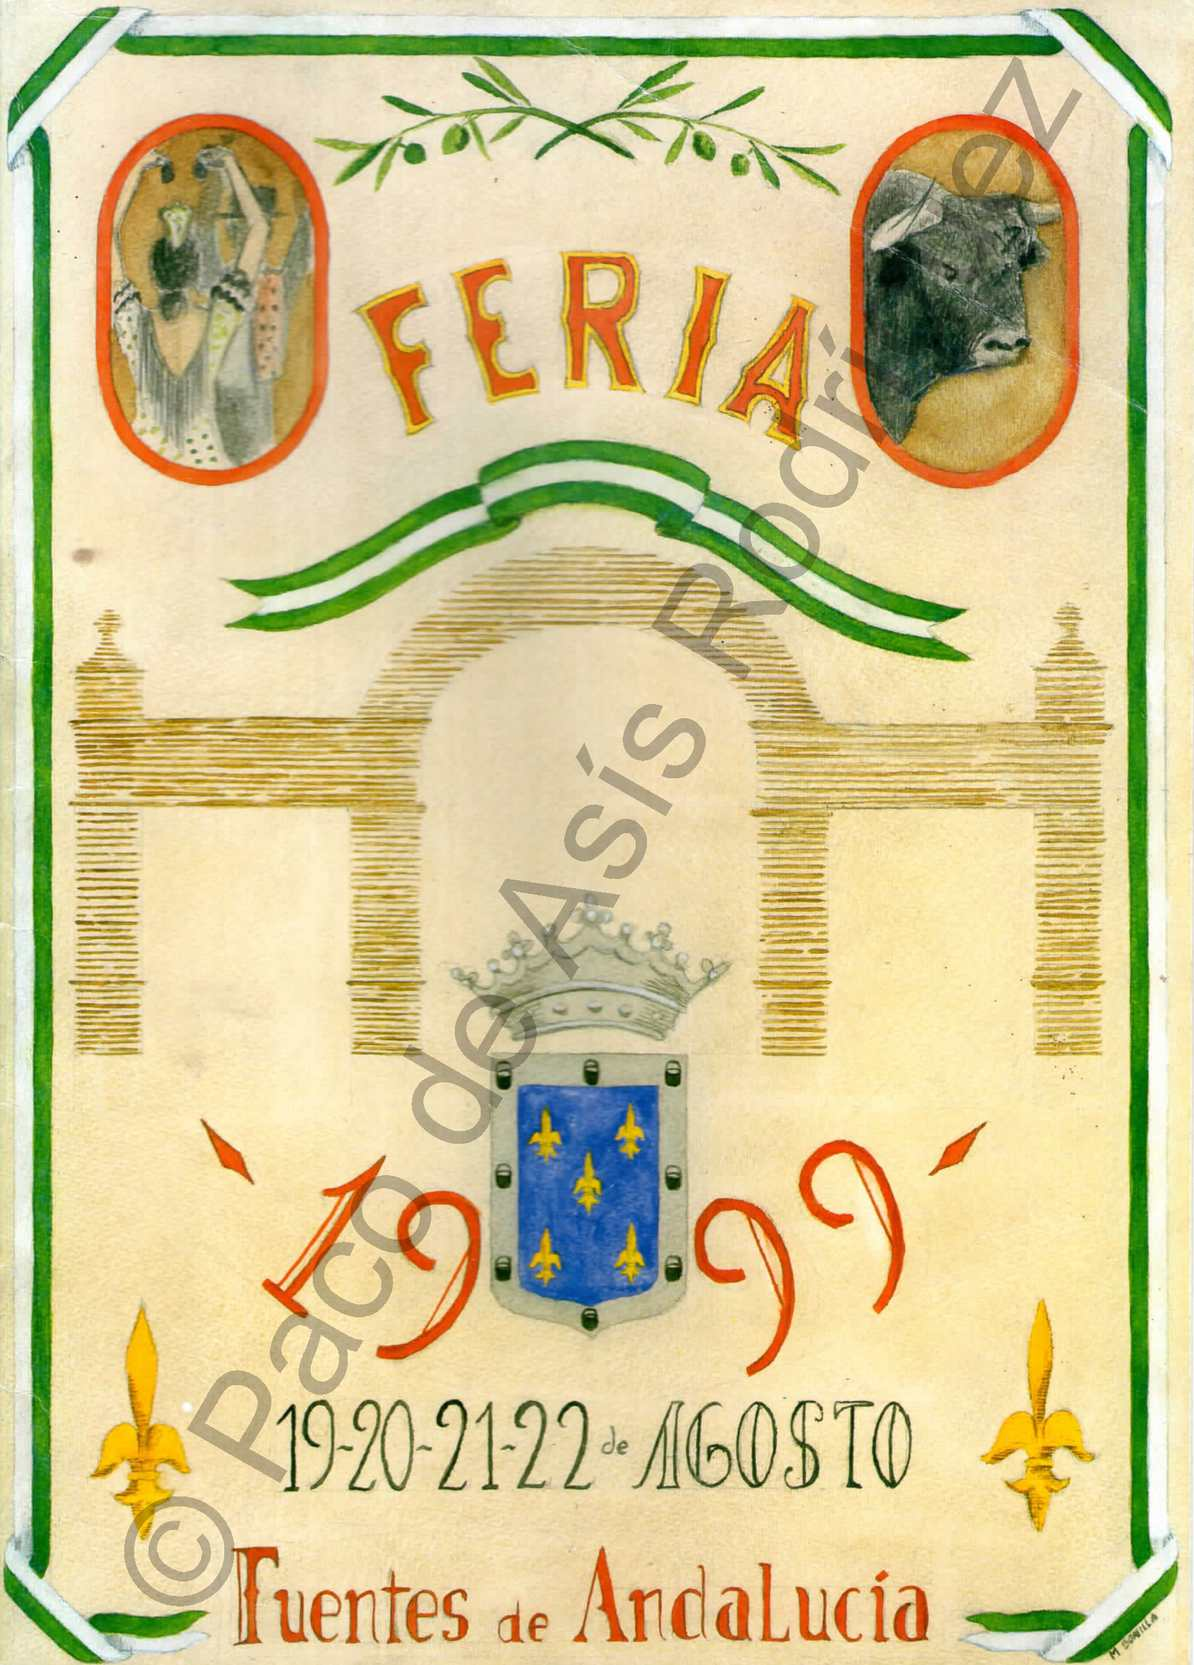 1999. REVISTA DE LA FERIA DE FUENTES DE ANDALUCÍA